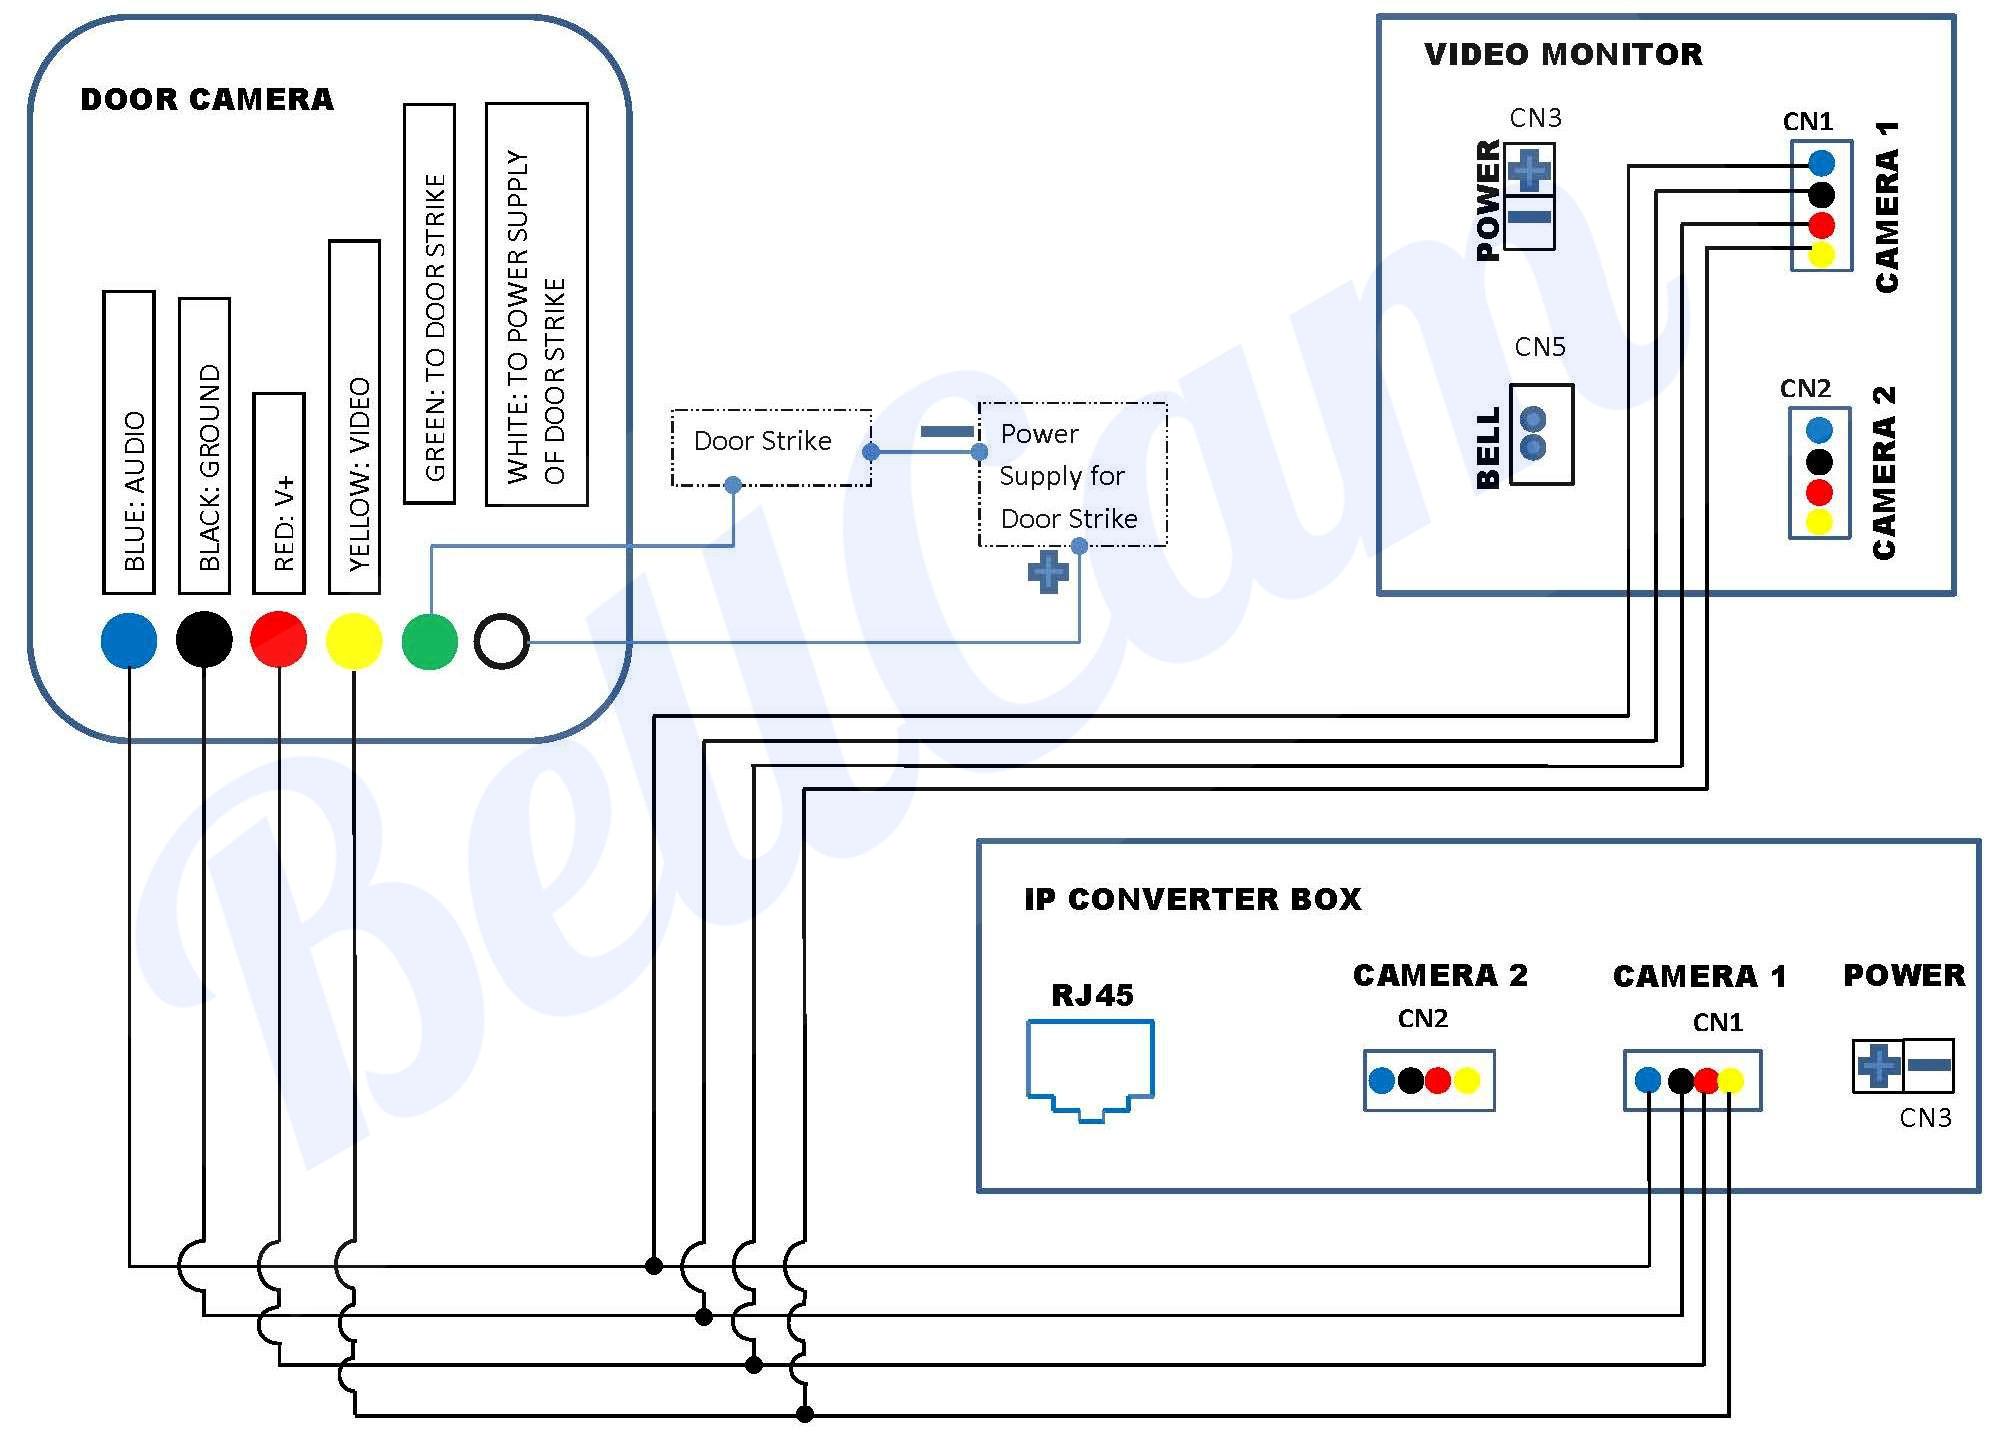 Item 47546 Wiring Diagram - All Wiring Diagram - Bunker Hill Security Camera Wiring Diagram